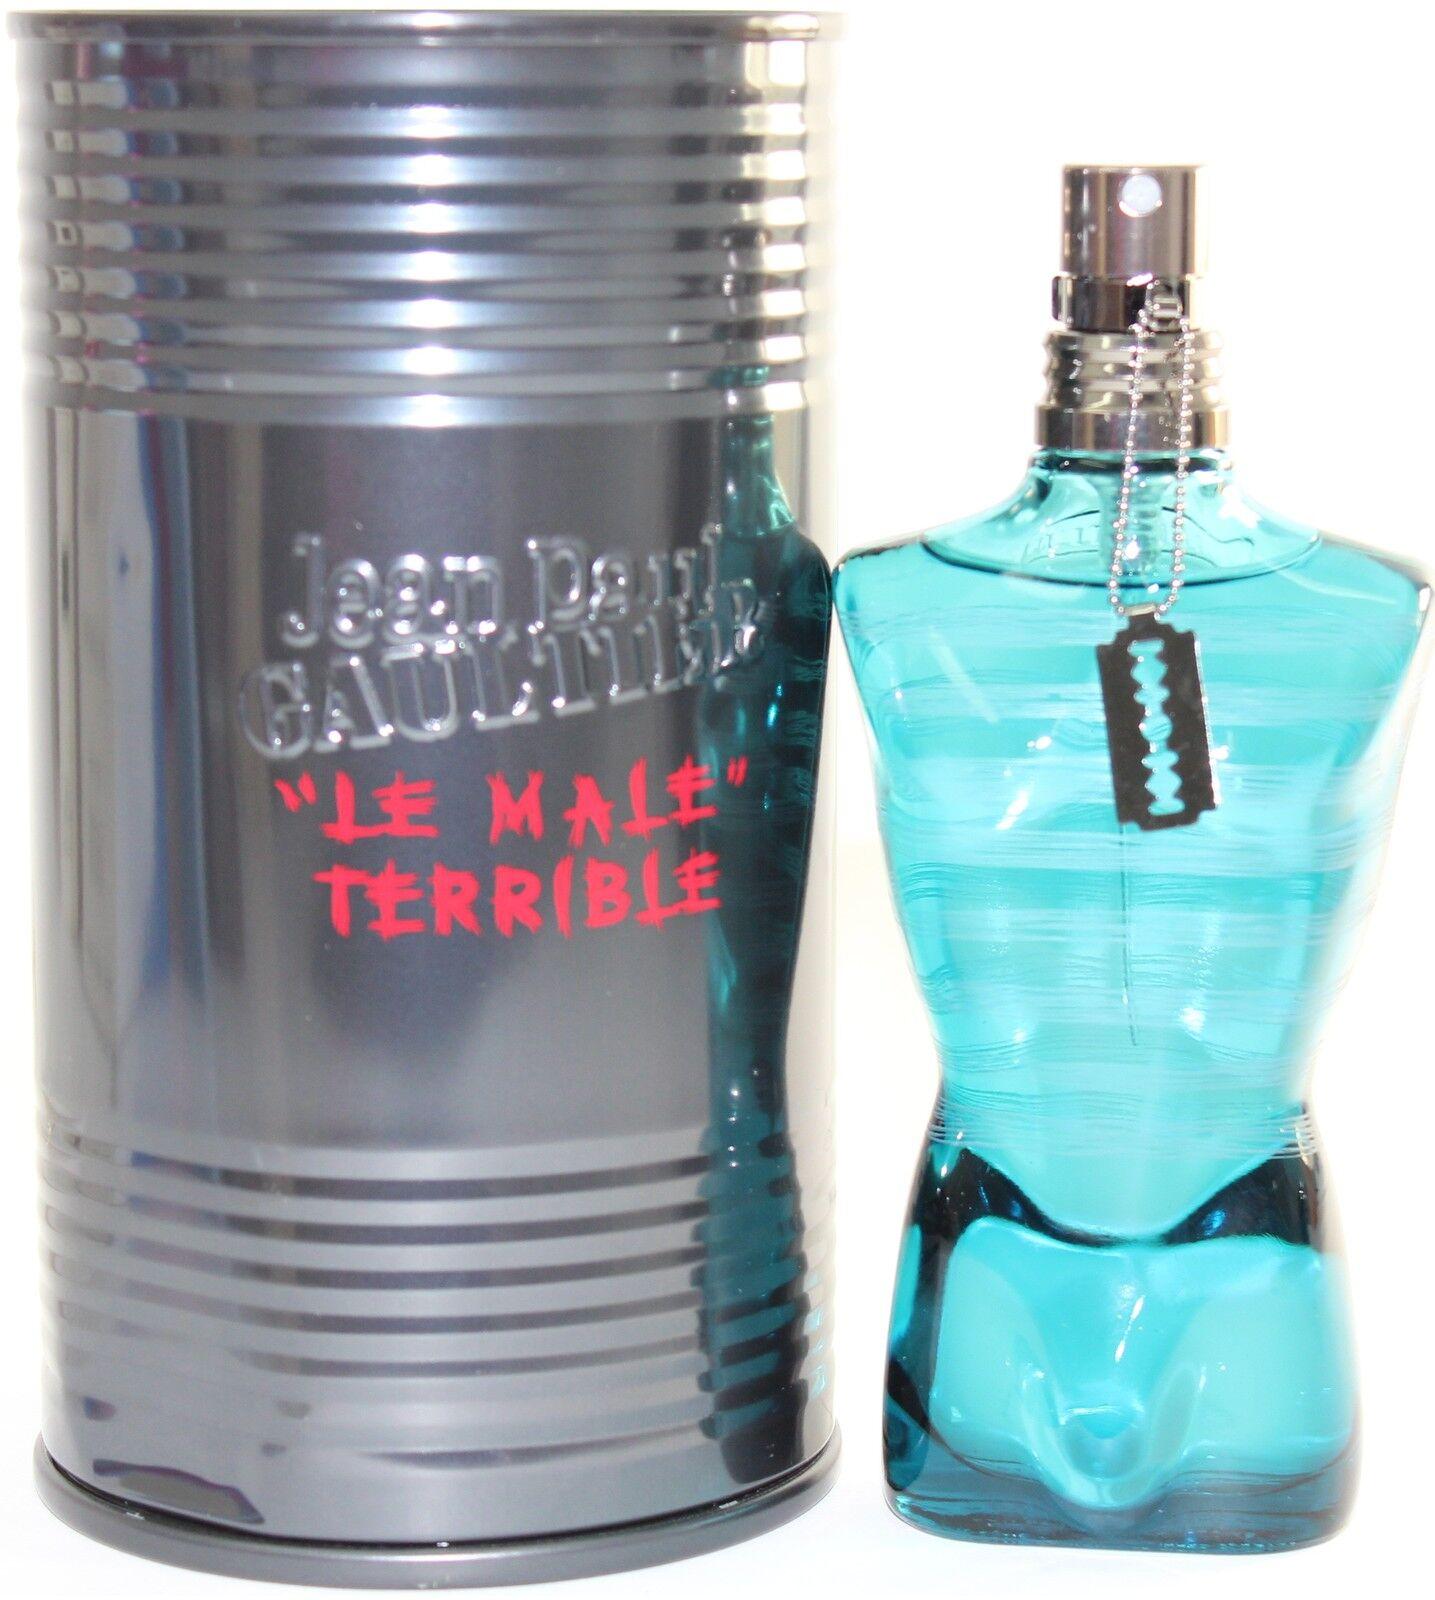 jean paul gaultier le male terrible 2 5 oz edt spray for. Black Bedroom Furniture Sets. Home Design Ideas